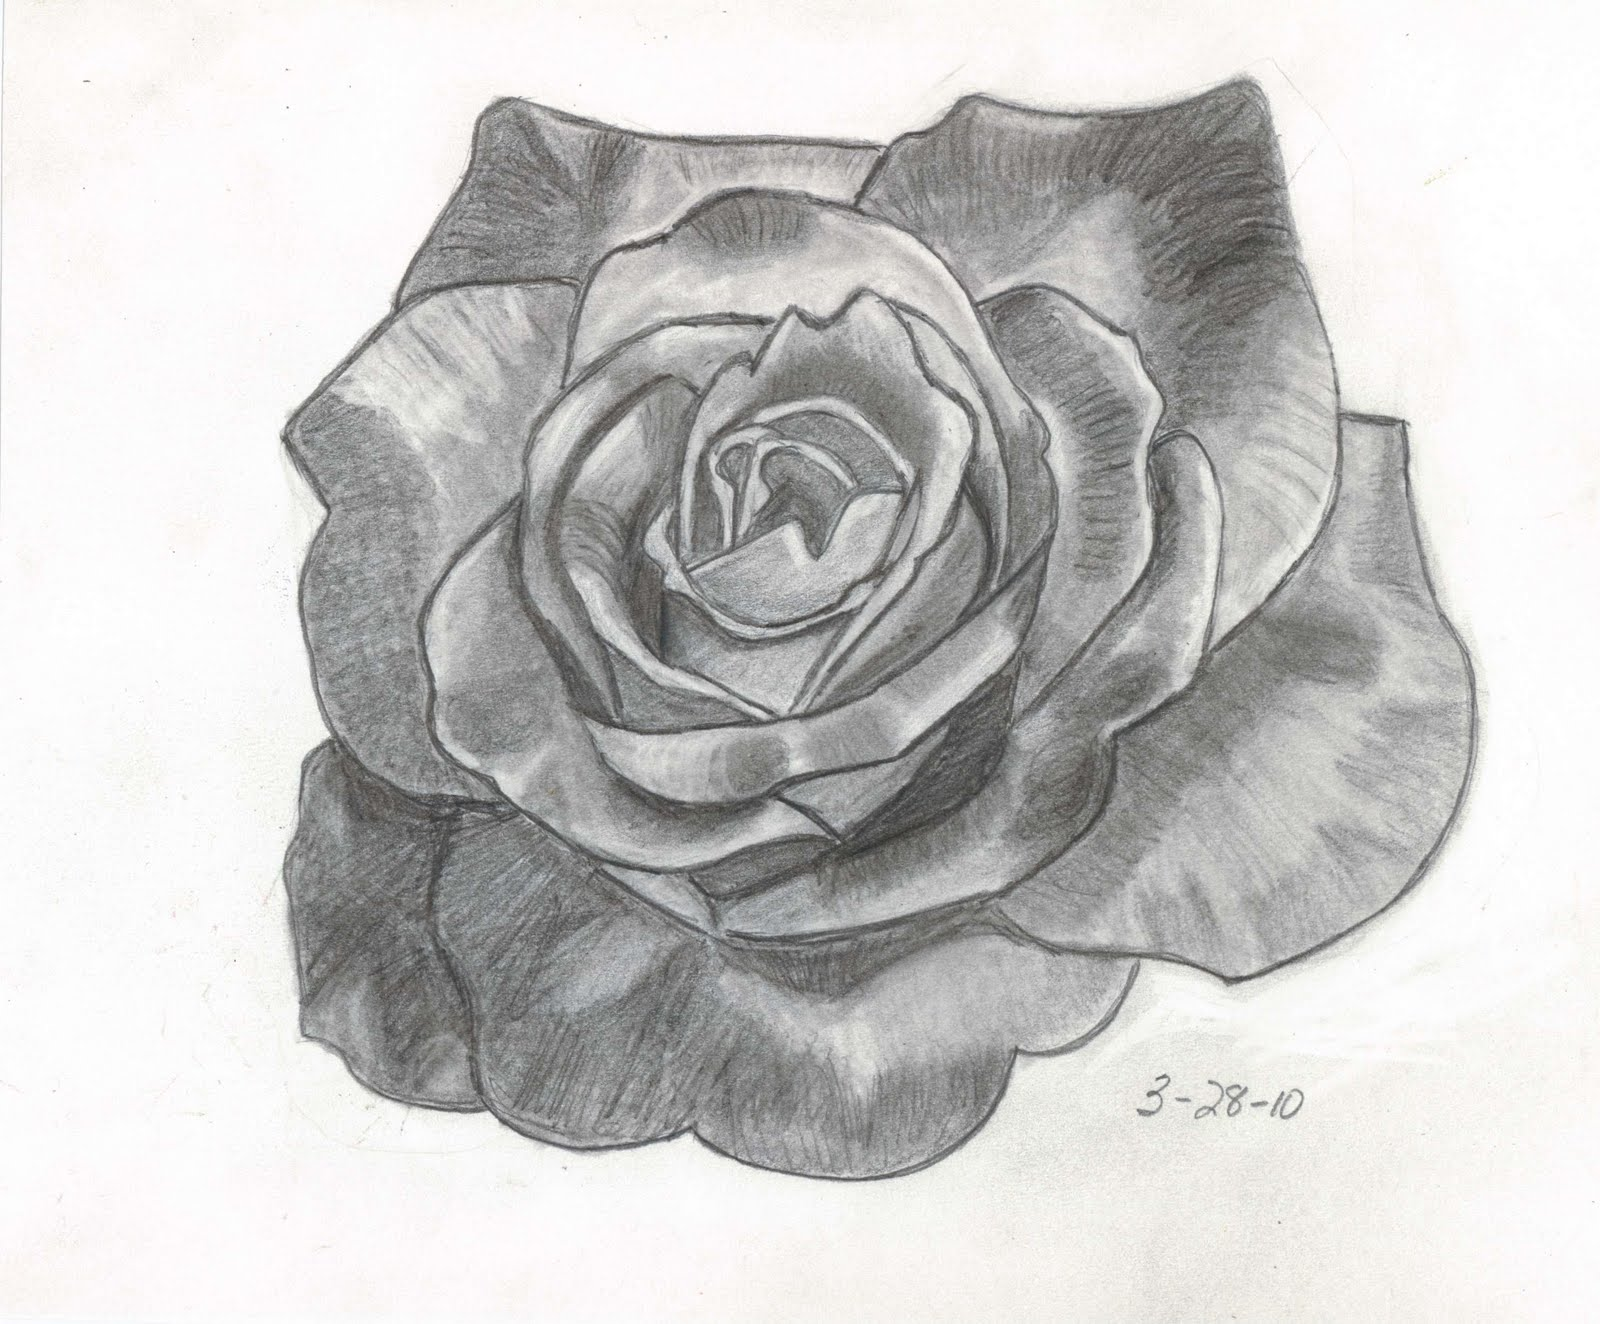 Drawn red rose pencil shading Rose  Image Best Shading